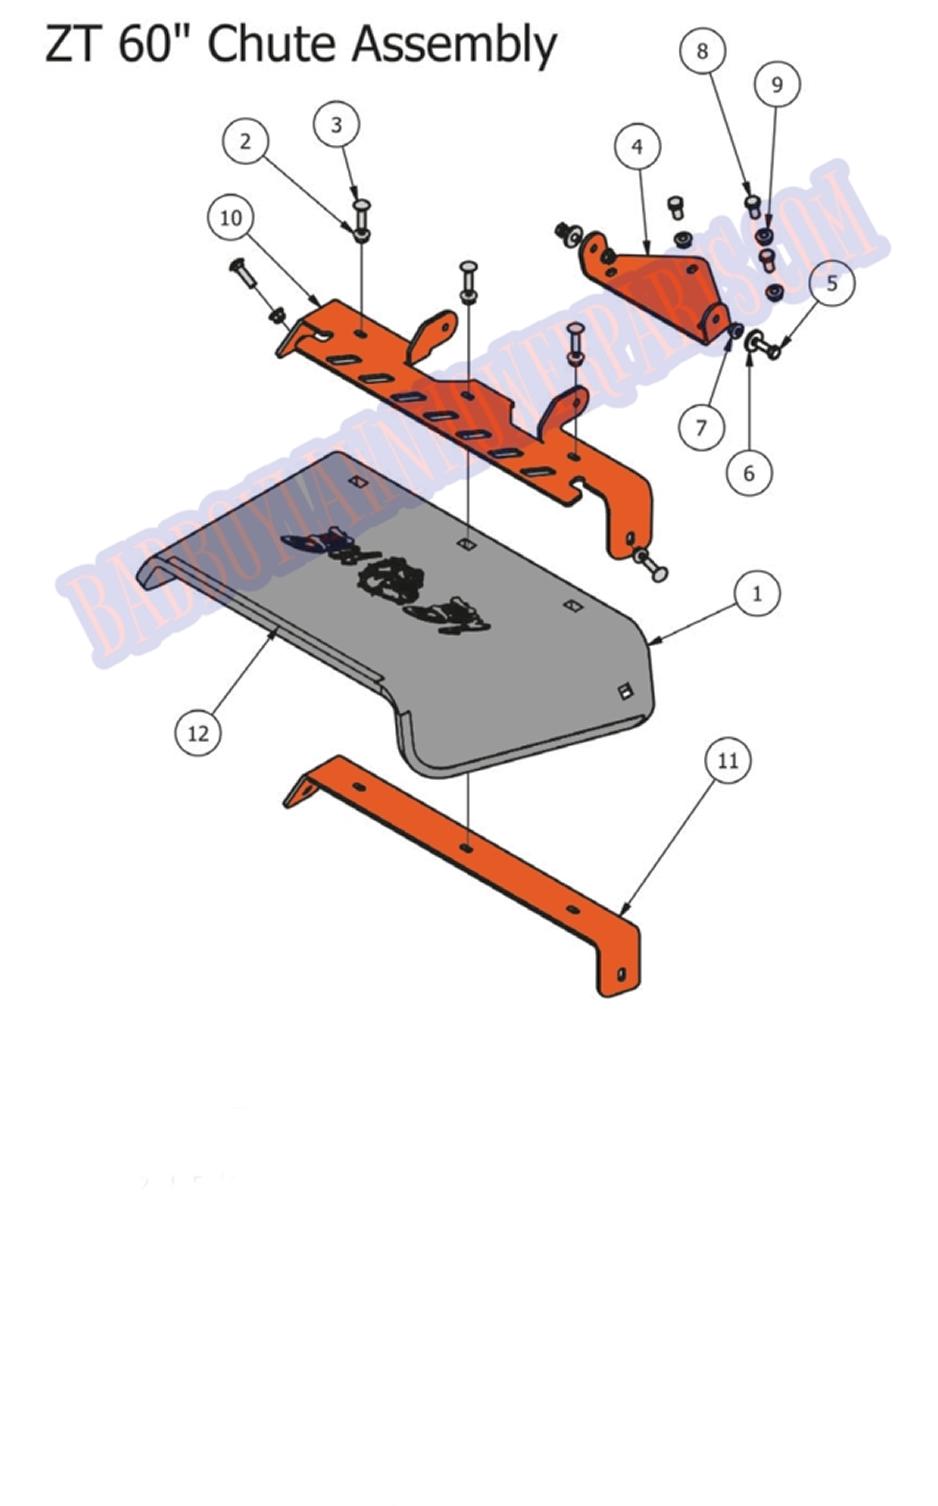 Discharge Push Mower Diagram Parts List For Model 416 Bolensparts